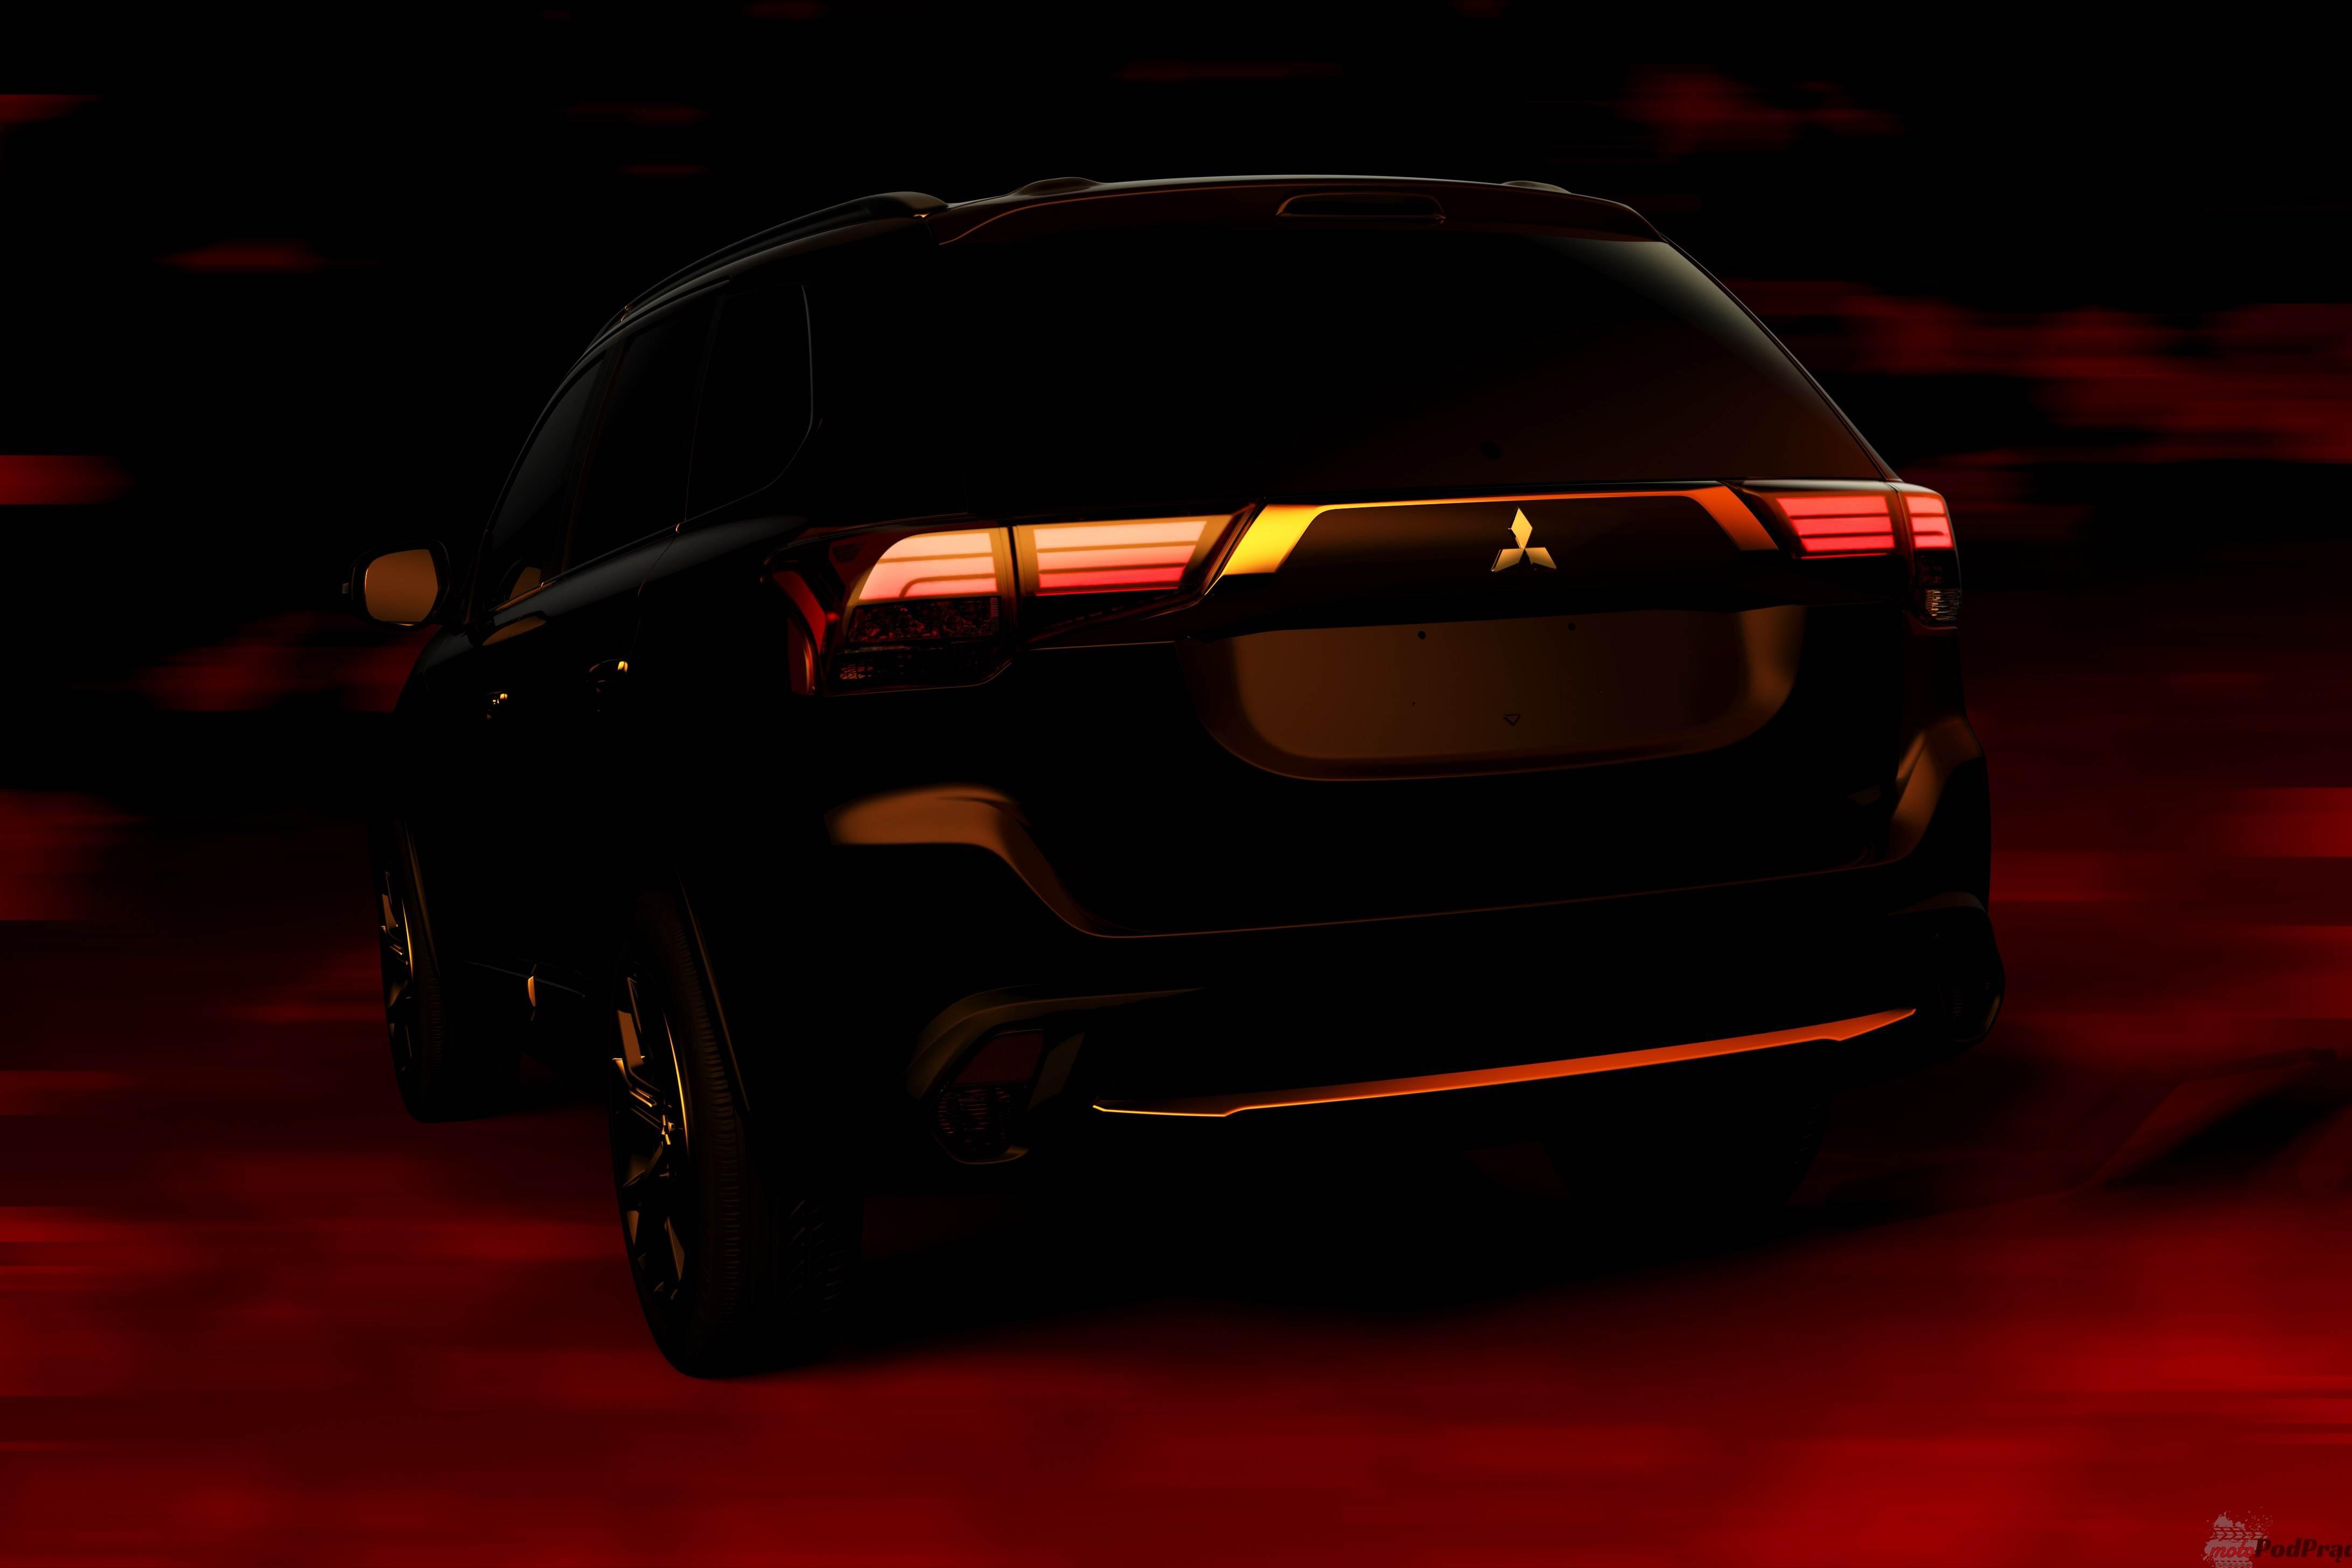 2016 Mitsubishi Outlander Rear Nowy Outlander już w kwietniu